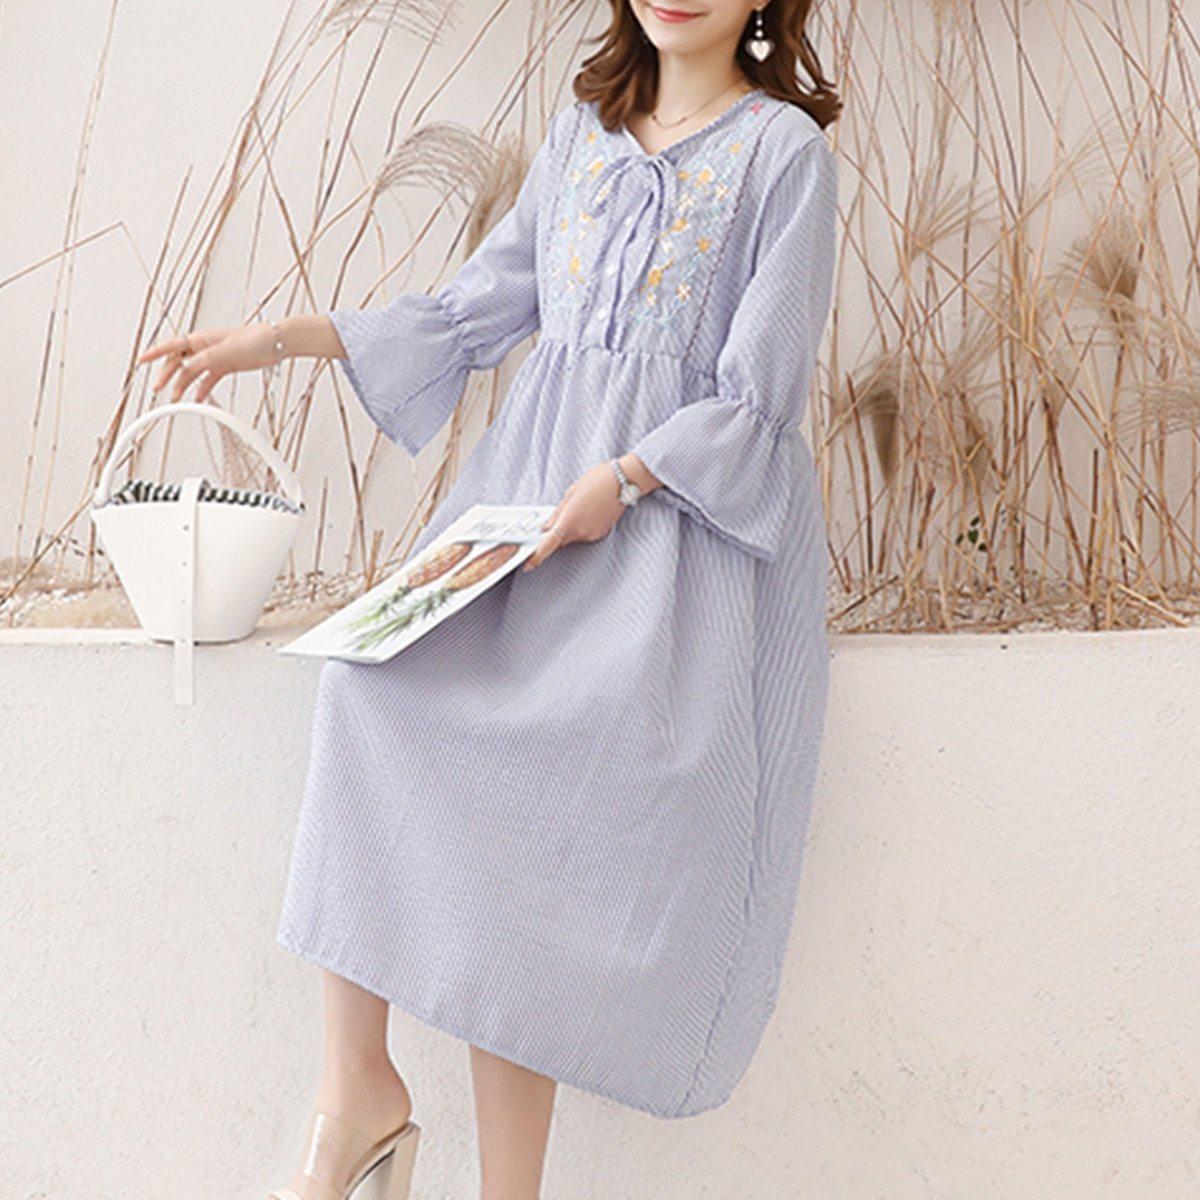 Maternity's Dress Fashion Long Sleeve Embroidery Pattern Loose Dress image 3